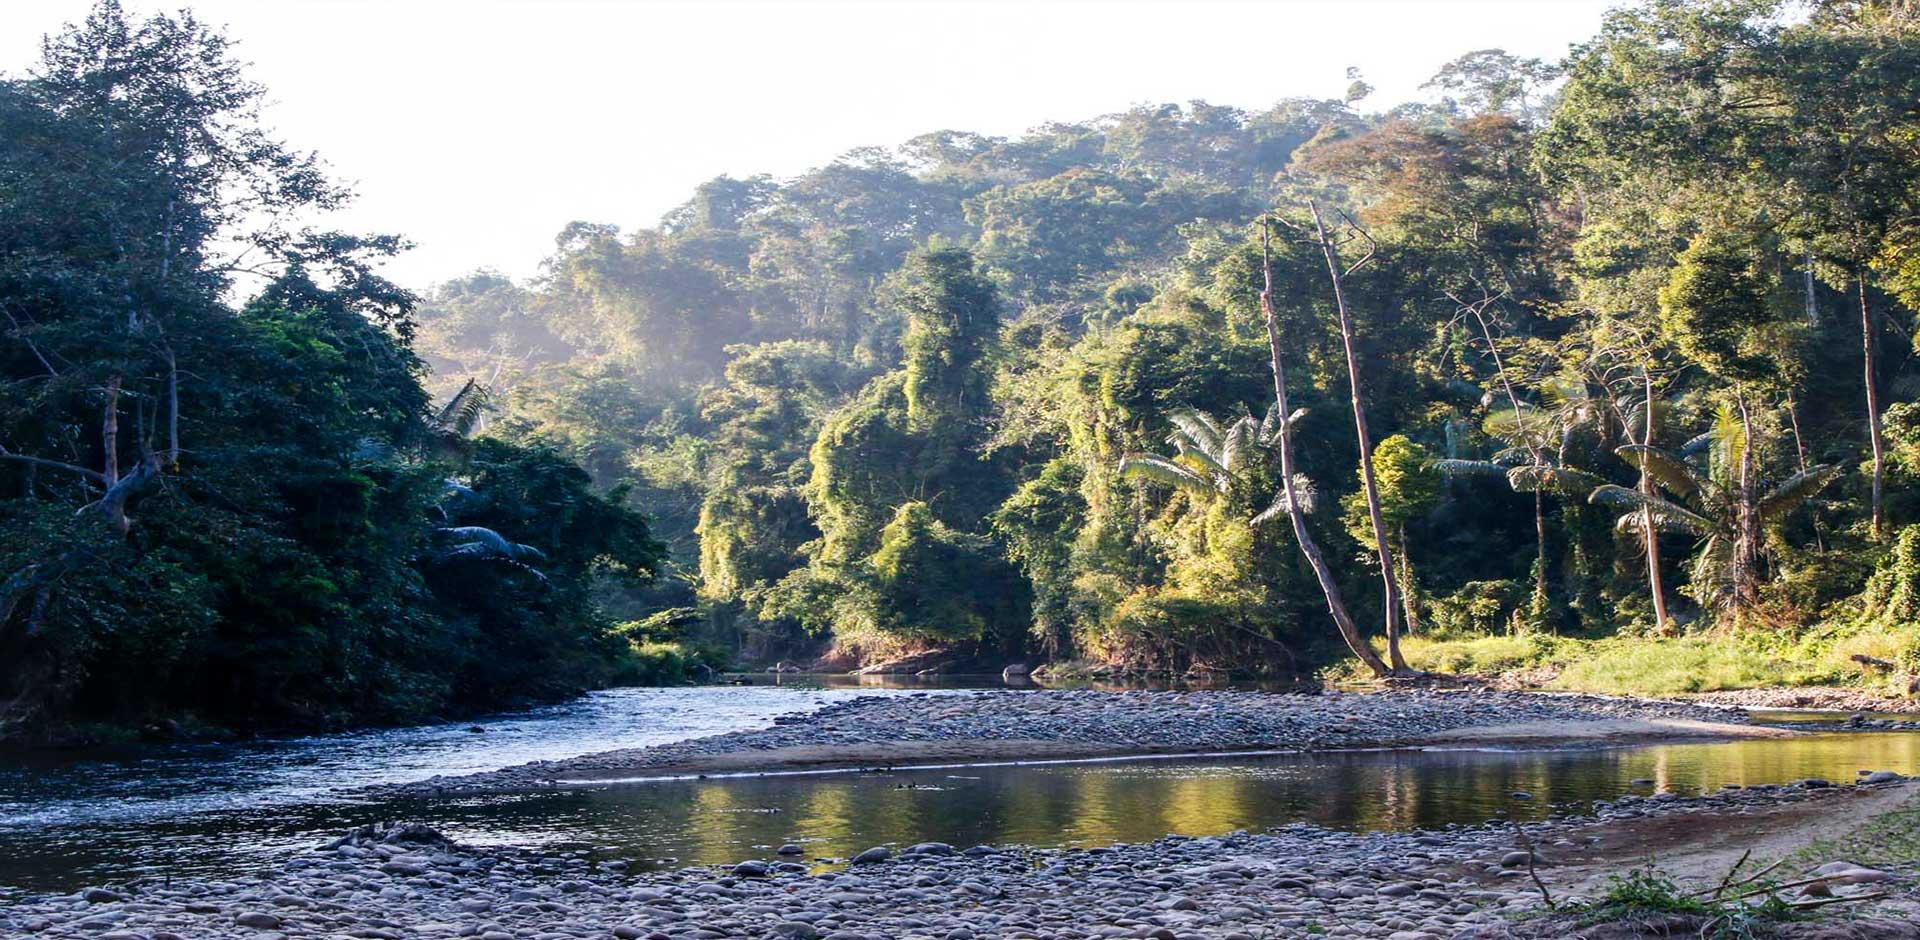 Nam Et-phou Louey National Park